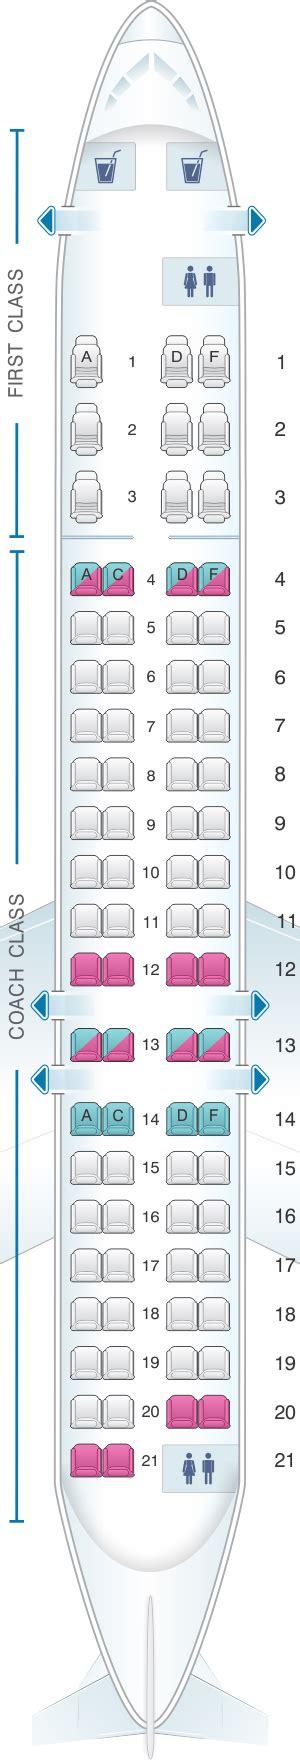 canadair regional jet seating seat map us airways bombardier canadair crj 900 79pax